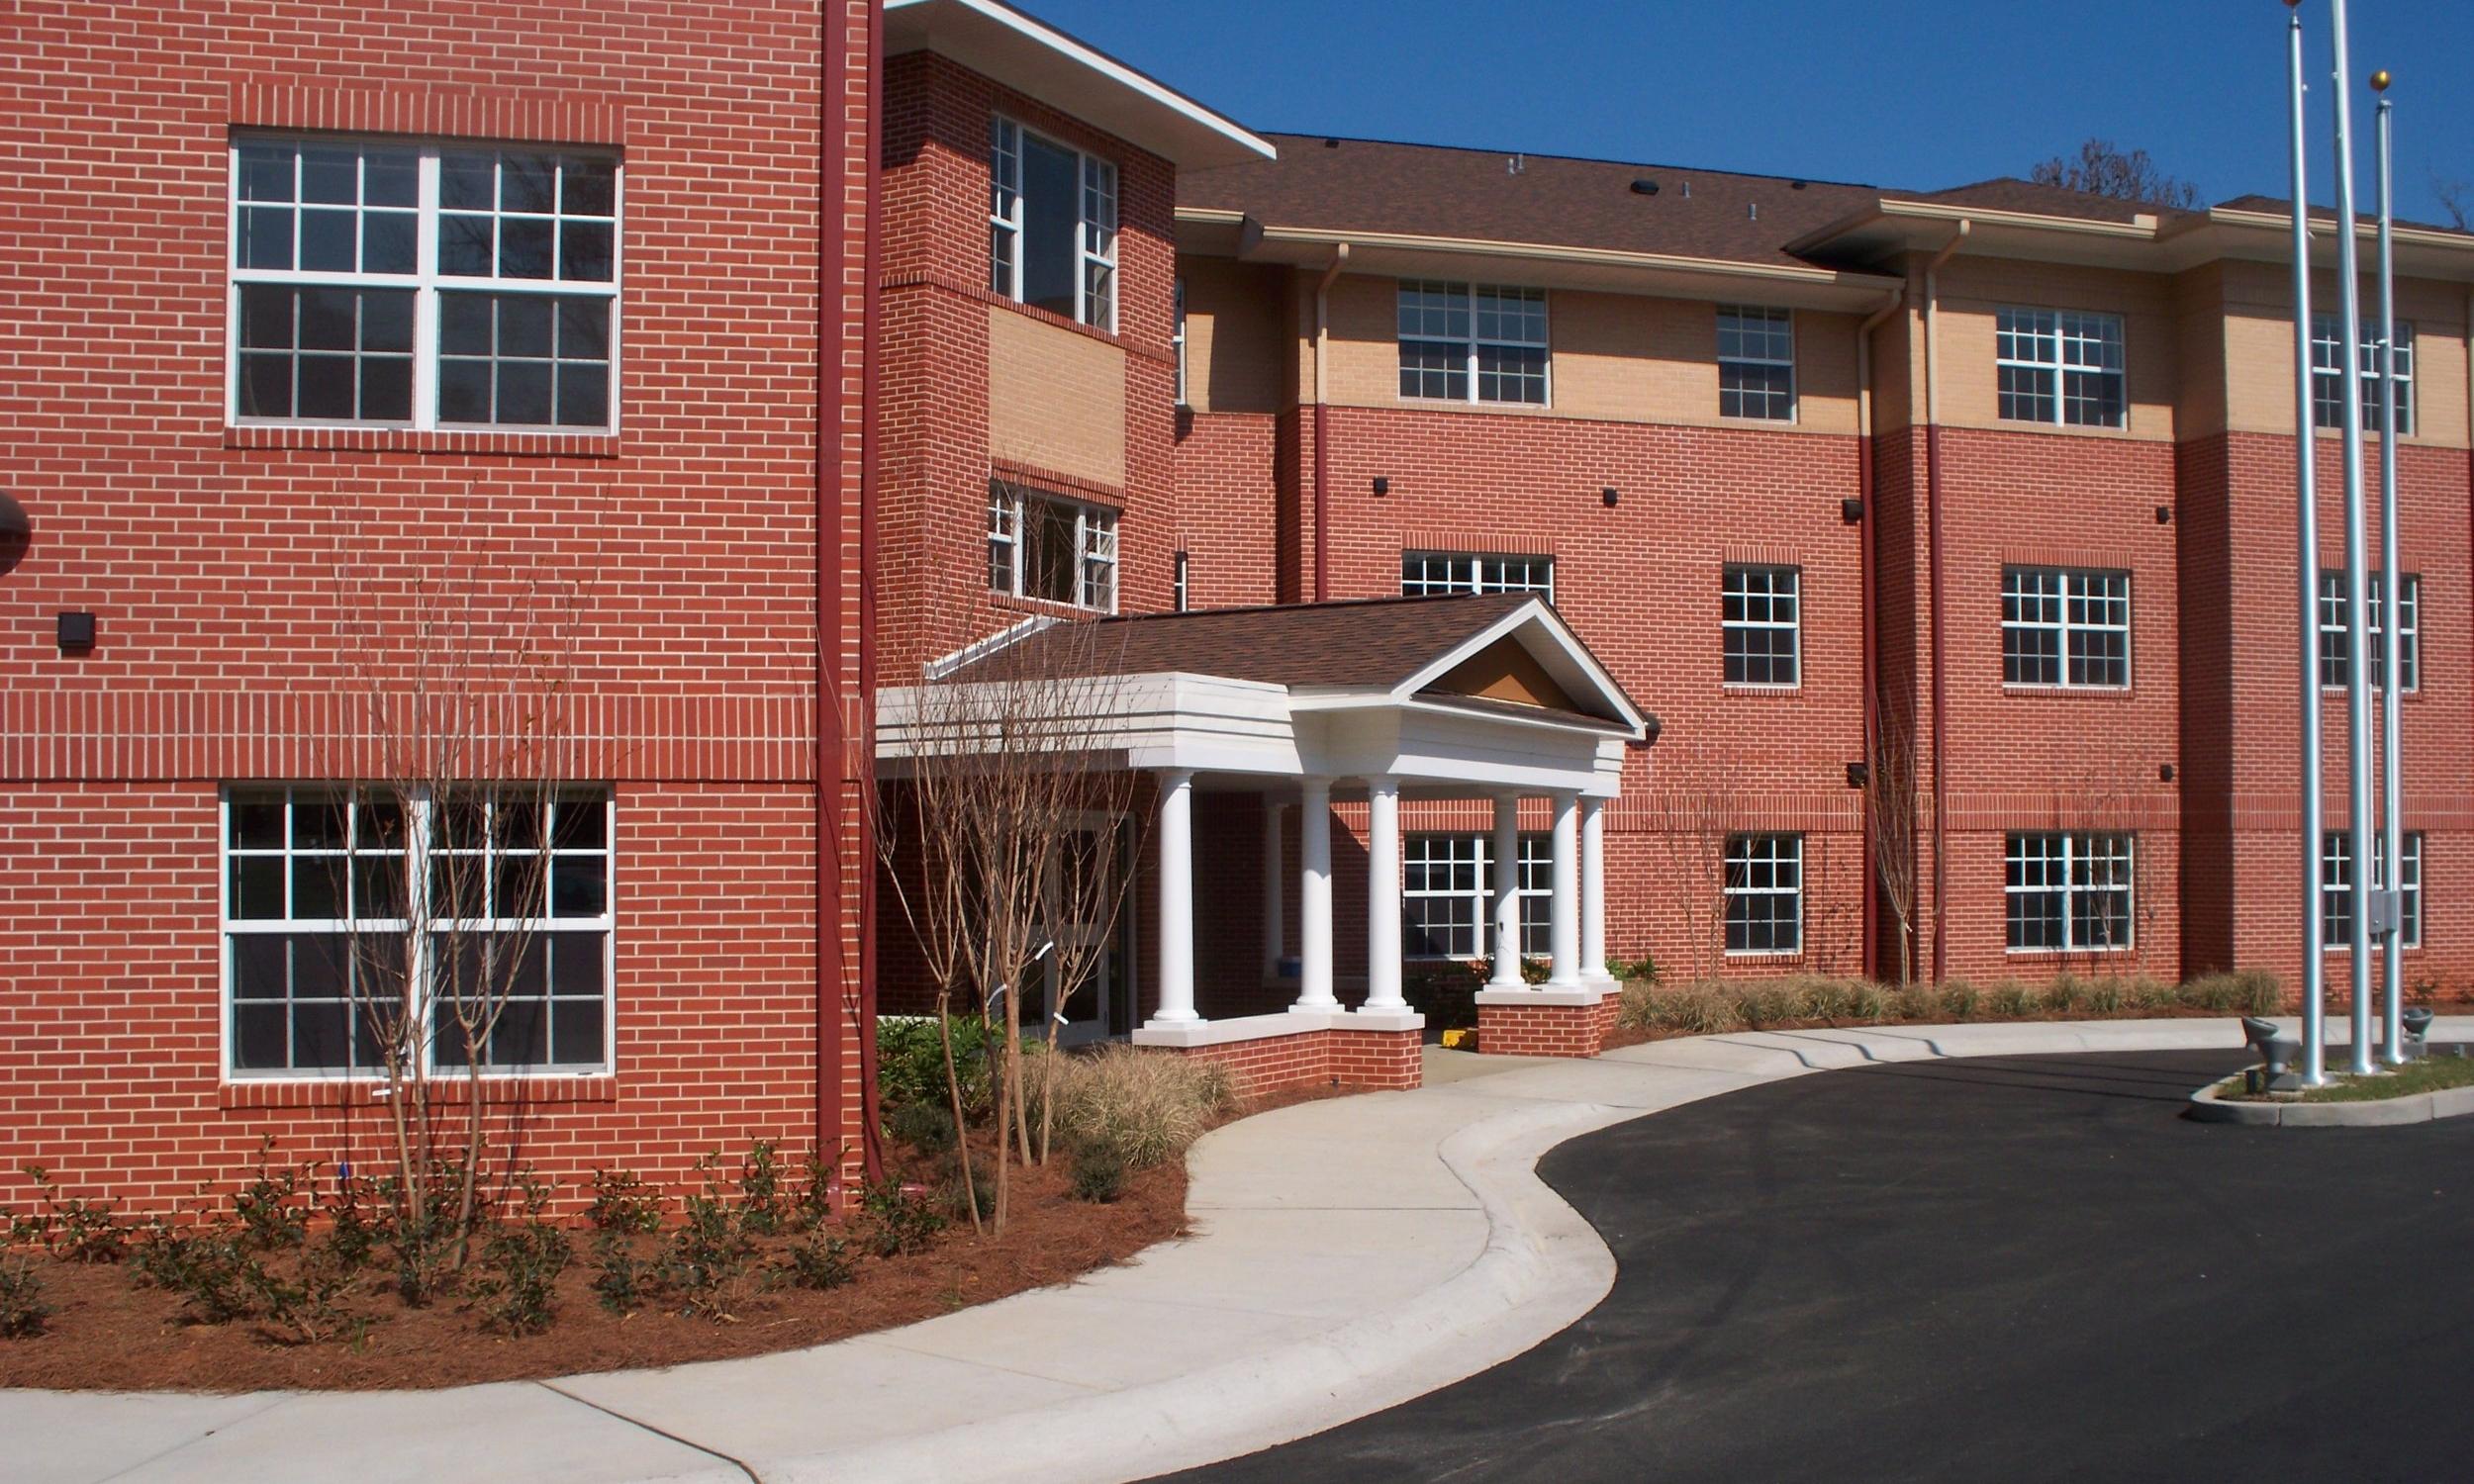 AHEPA 310 XII Senior Apartments - 1409 Pollard RoadDaphne, AL 36526(251) 626-9228 TTY: (800) 421-1220 or 711 (English)TTY: (800) 676-4290 or 711 (Español)info@ahepahousing.org